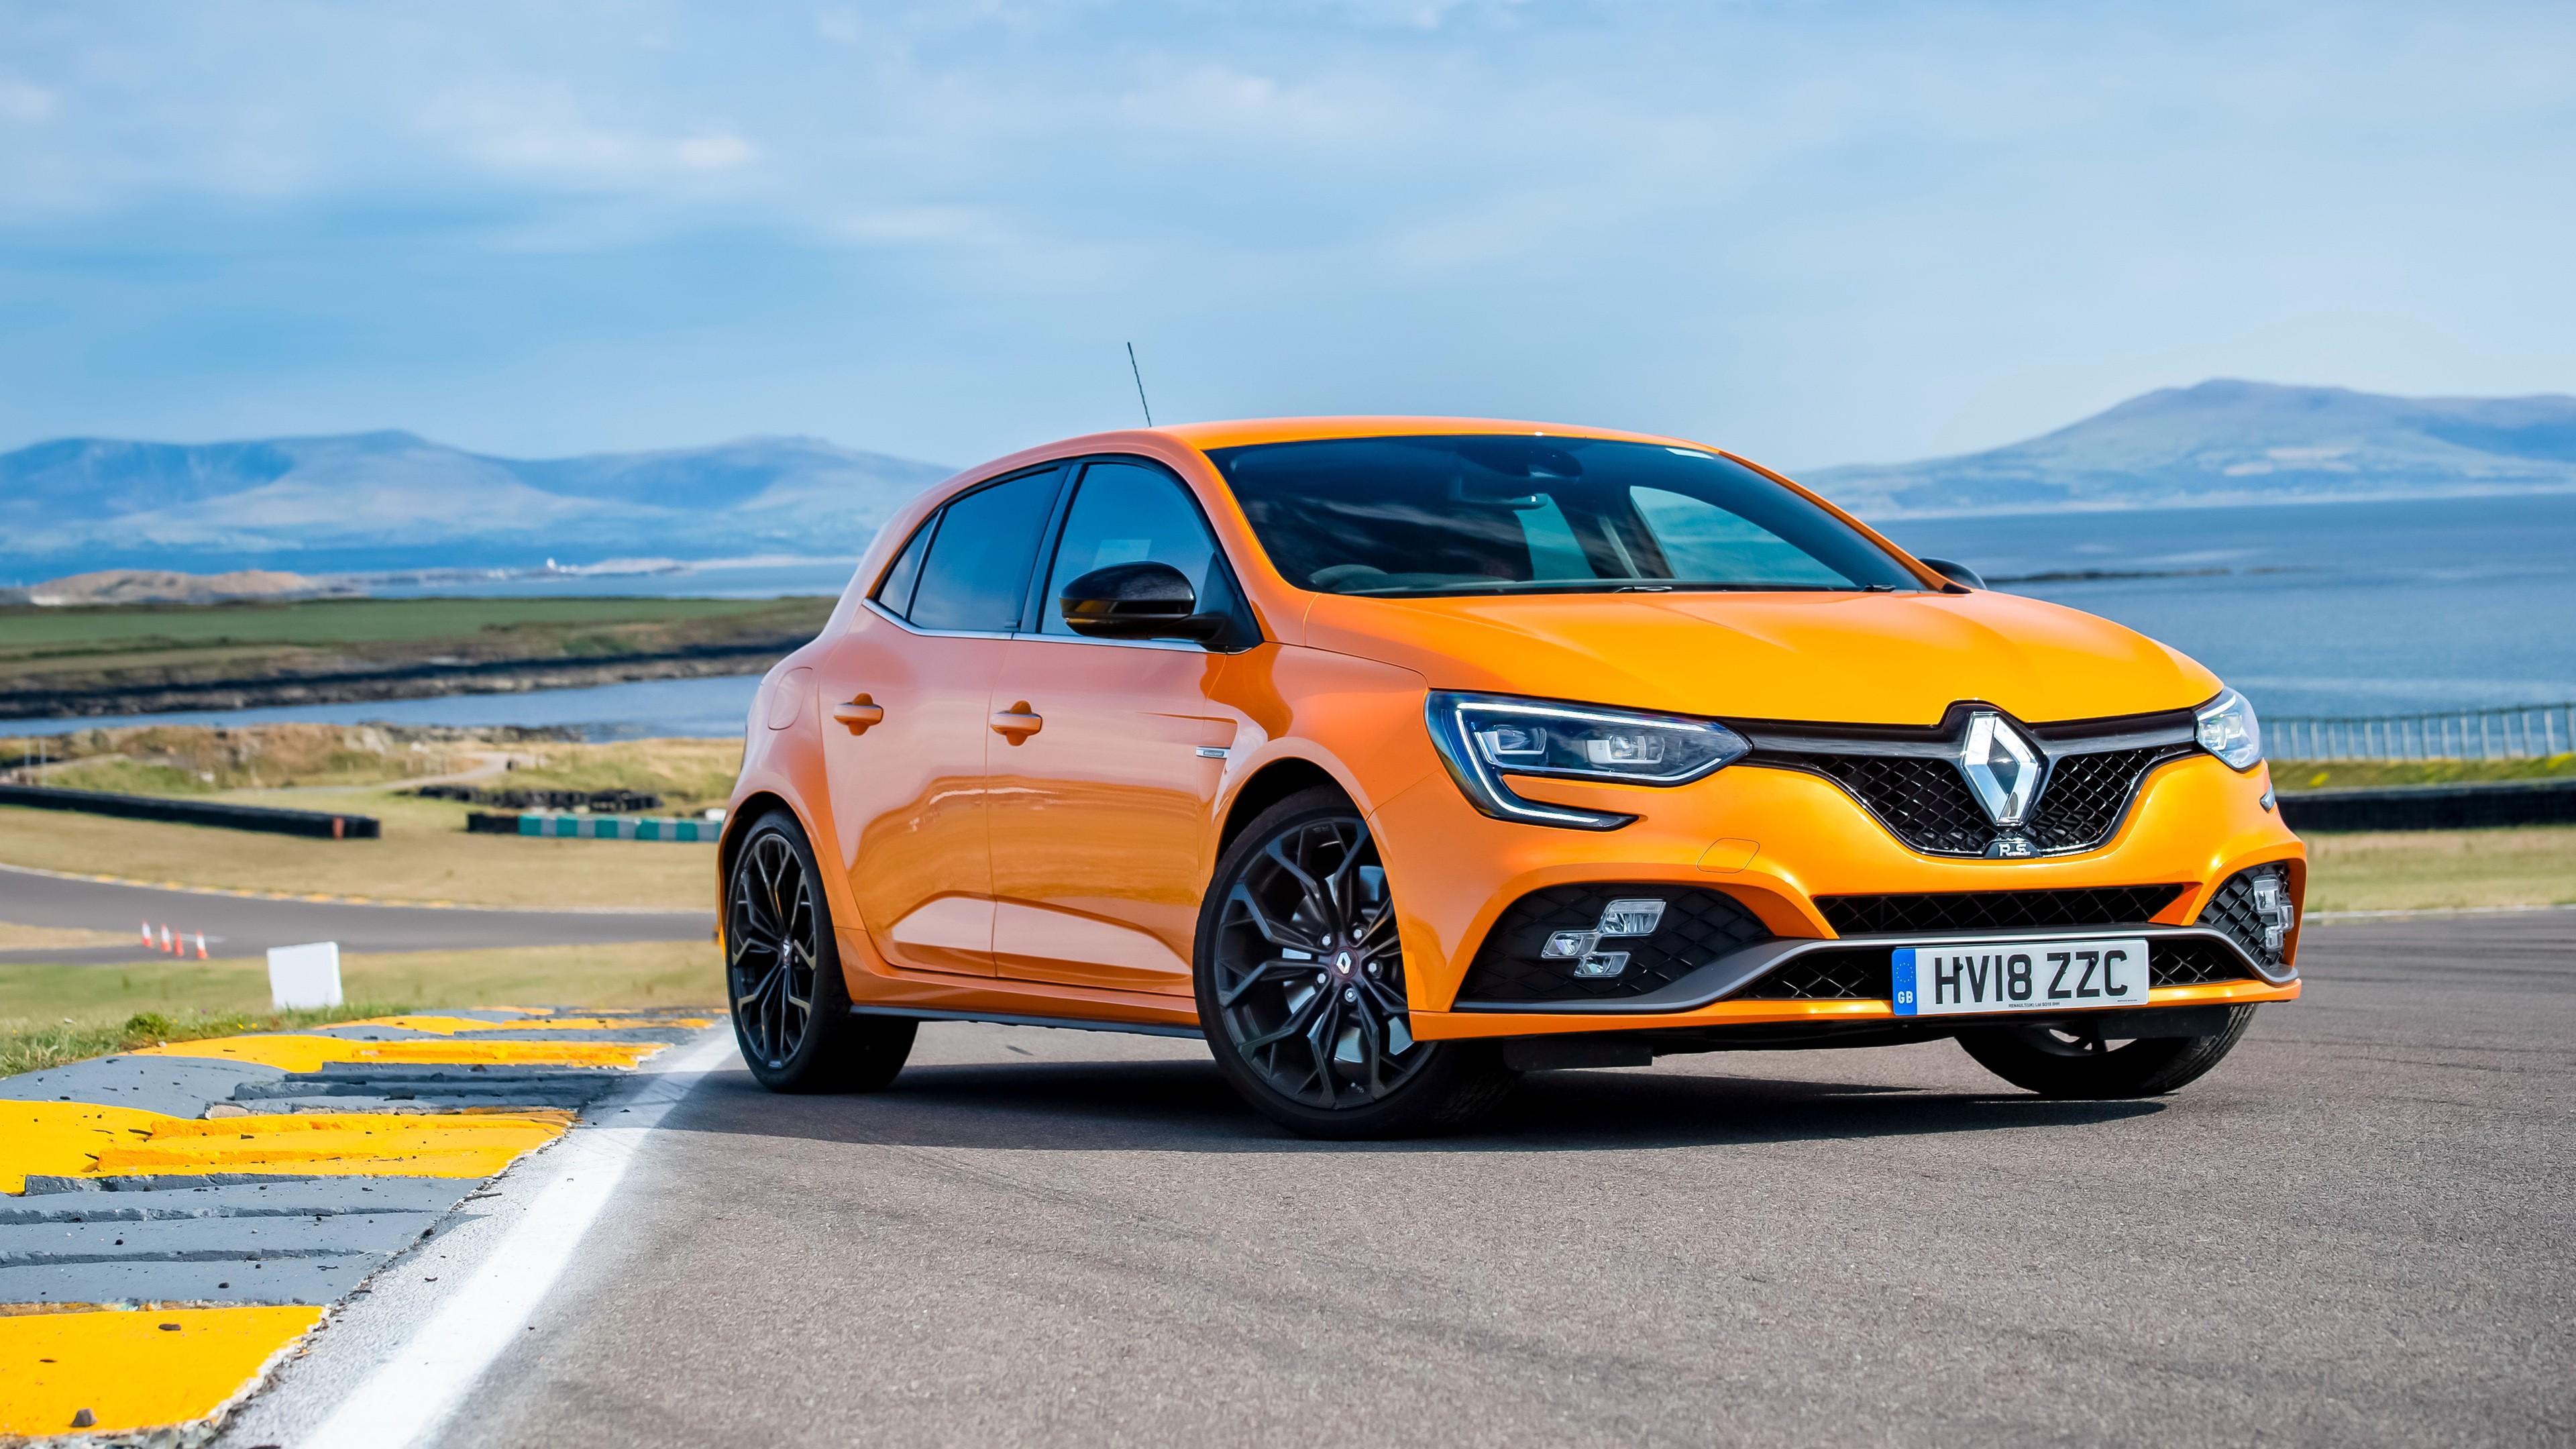 Renault Megane Rs 280 Cup 2018 4k Wallpaper Hd Car Wallpapers Id 10882